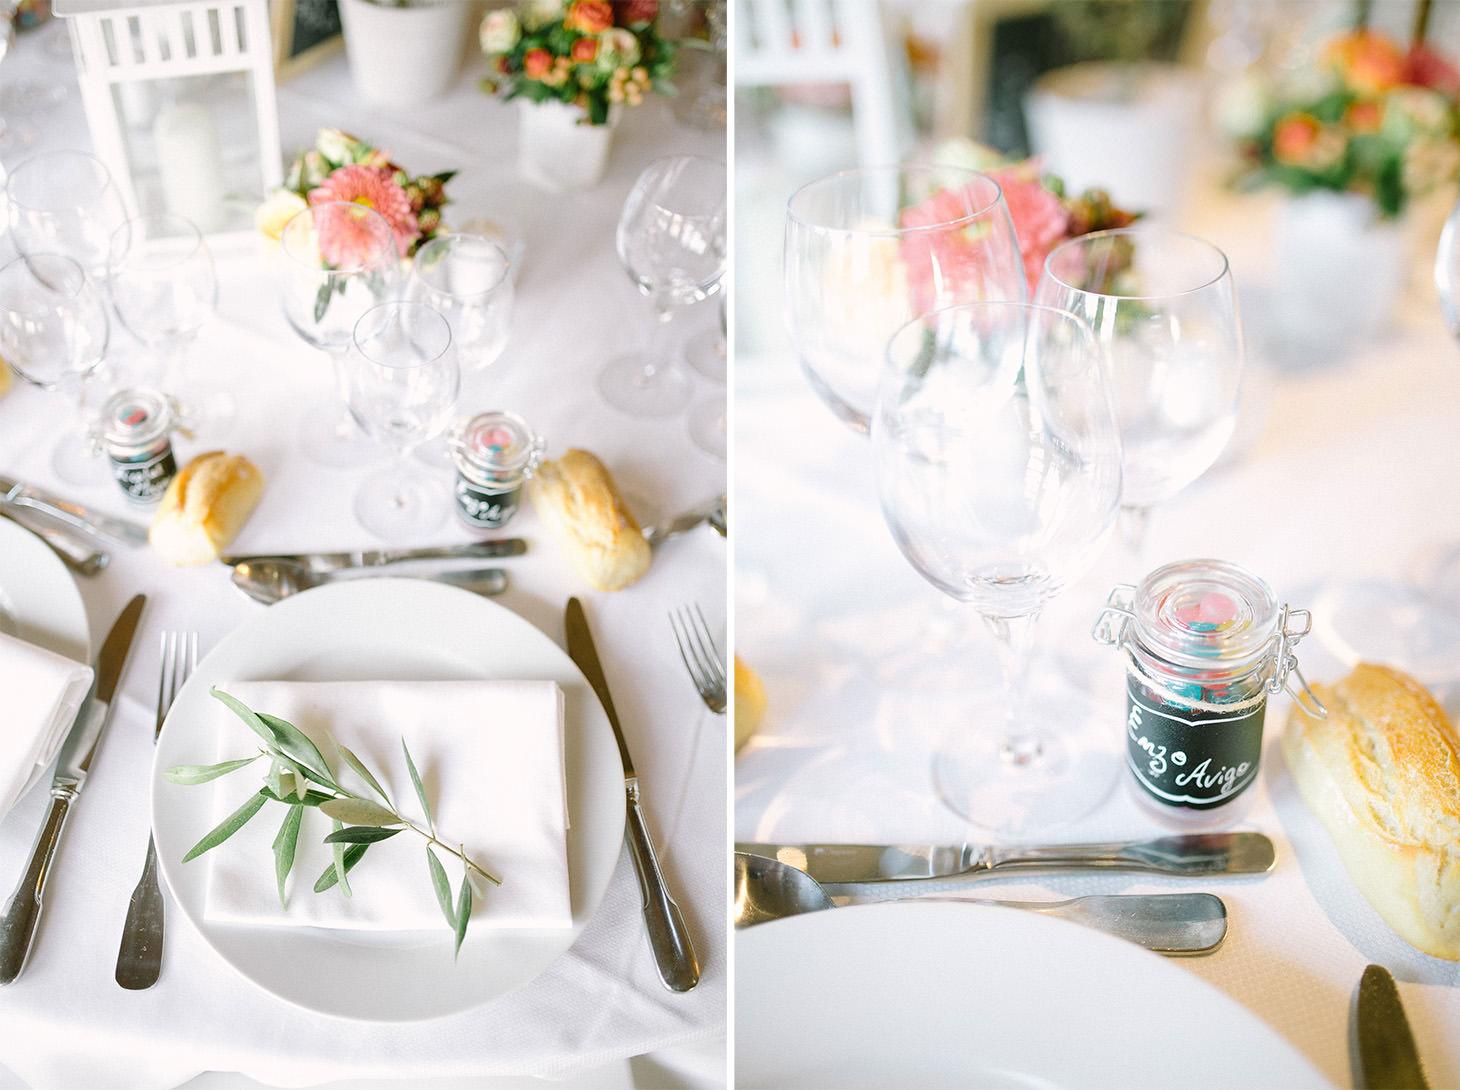 photographe-mariage-paris-montfort-l-amaury-073